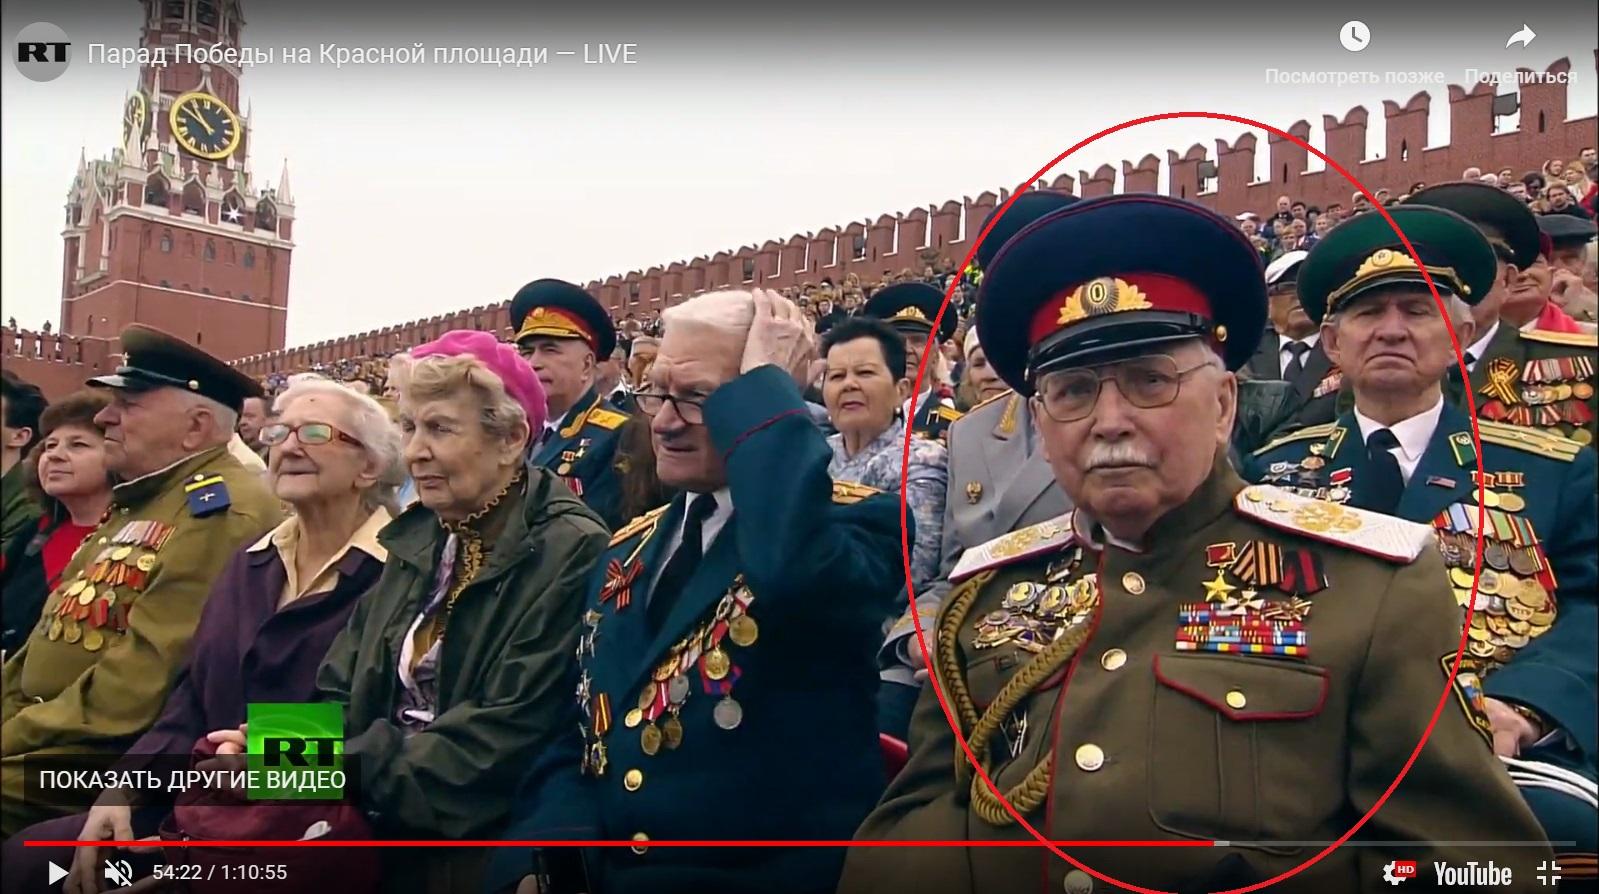 http://www.imageup.ru/img161/3360729/53160467_.jpg